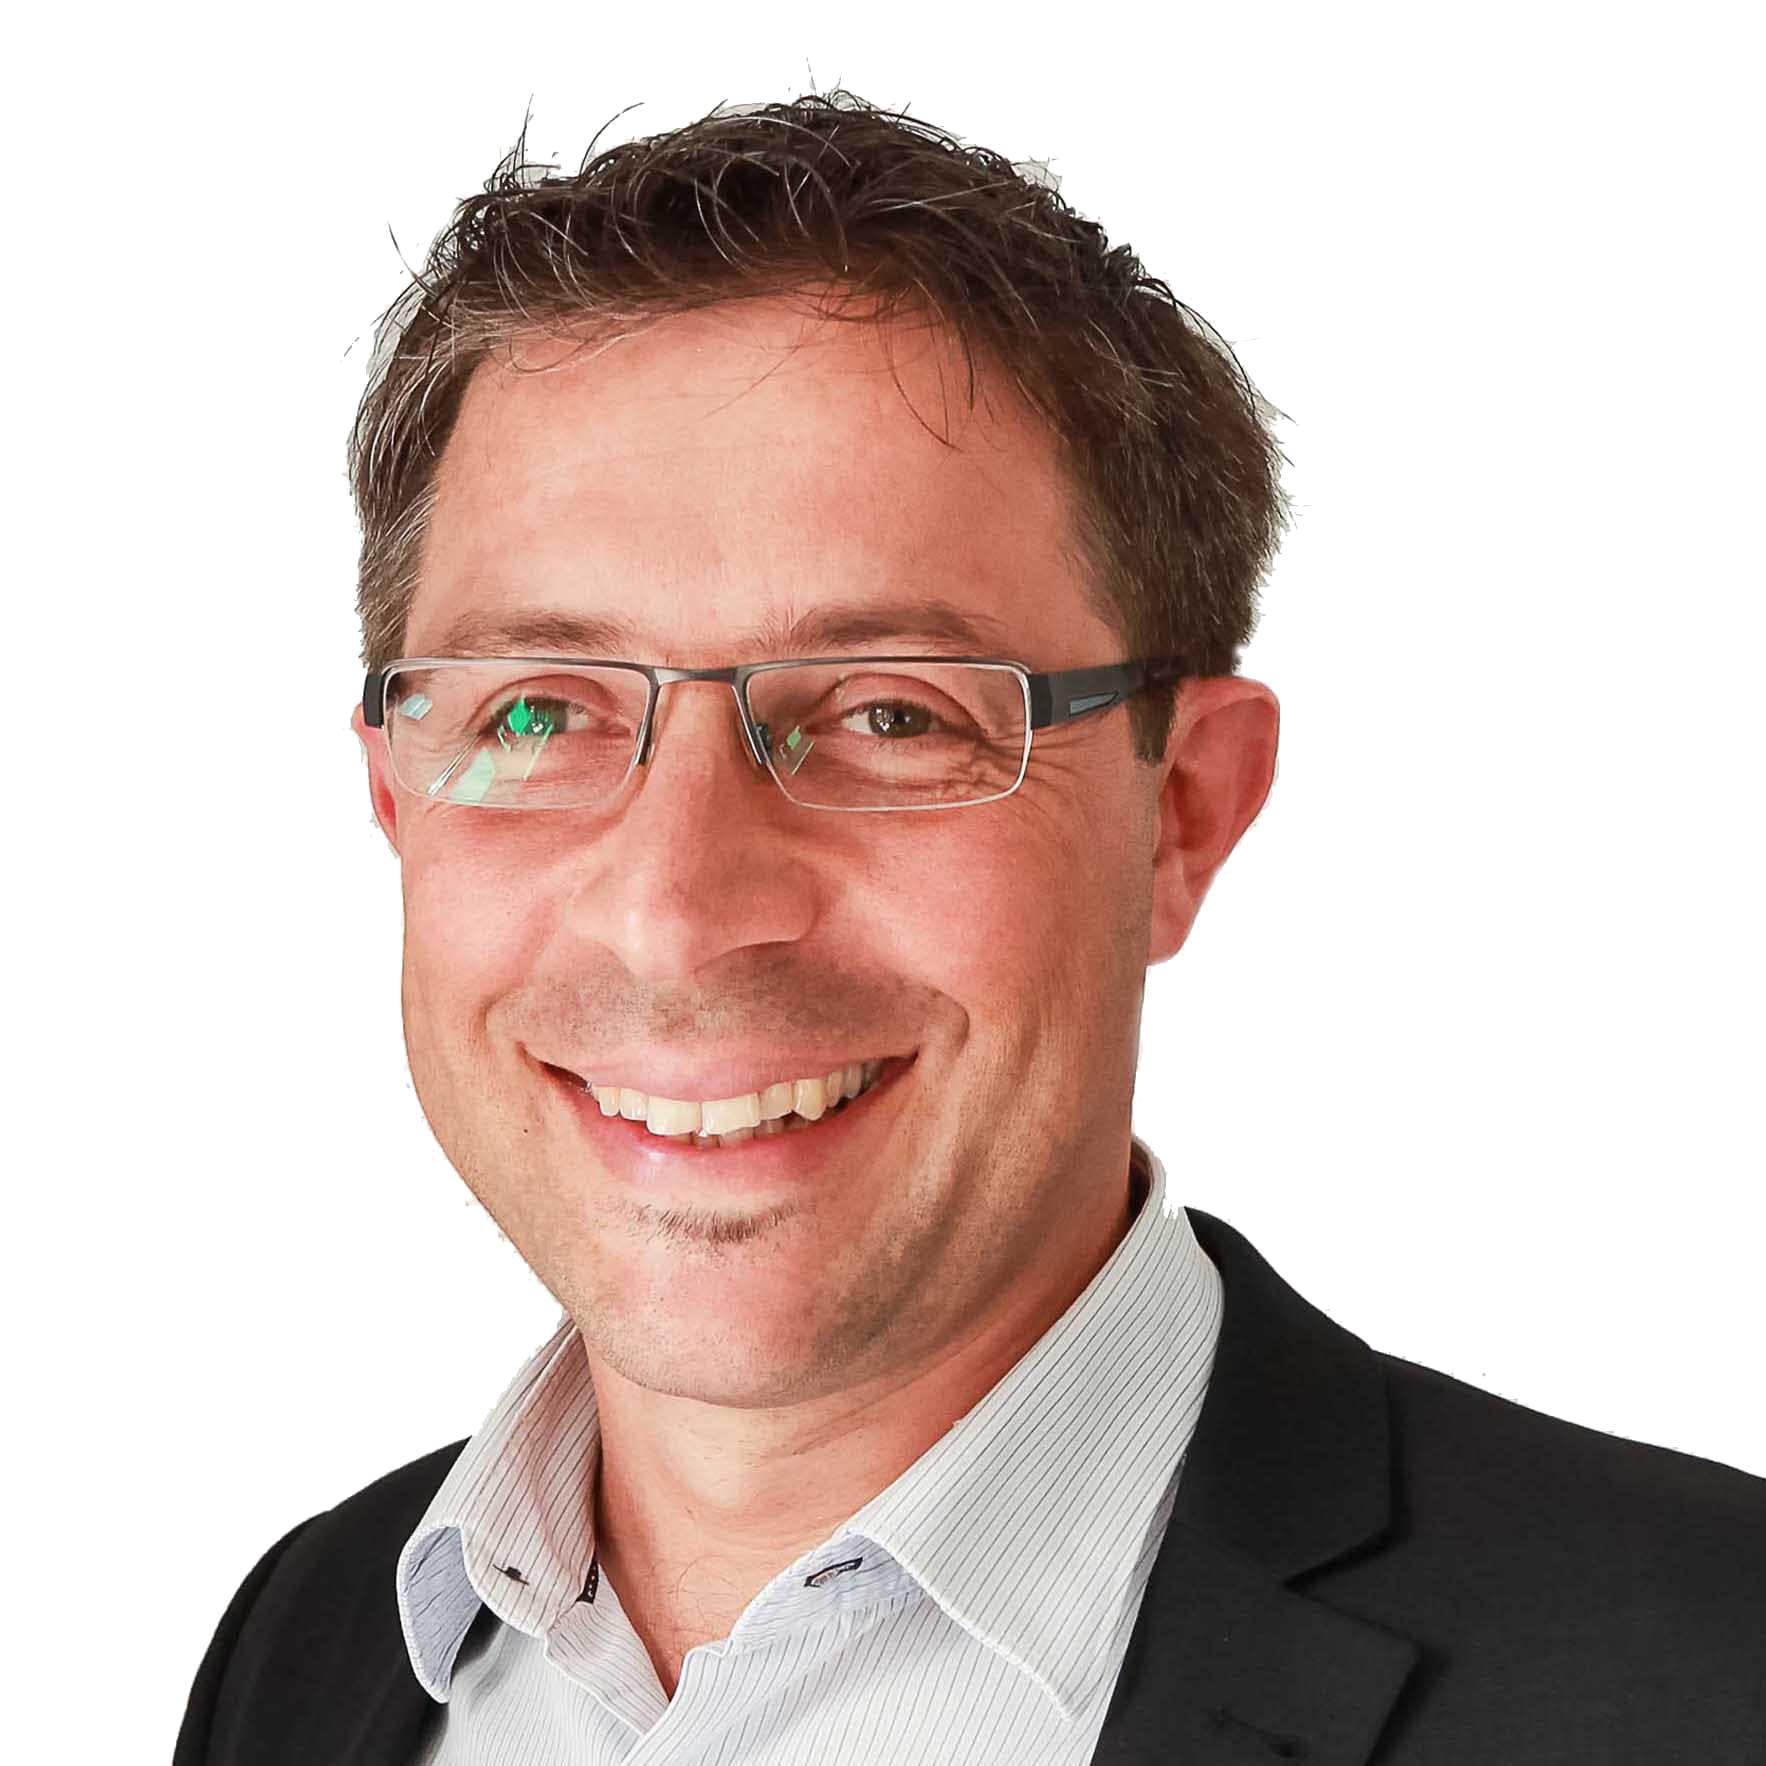 Luca Caralvi - VP Sales & Marketing